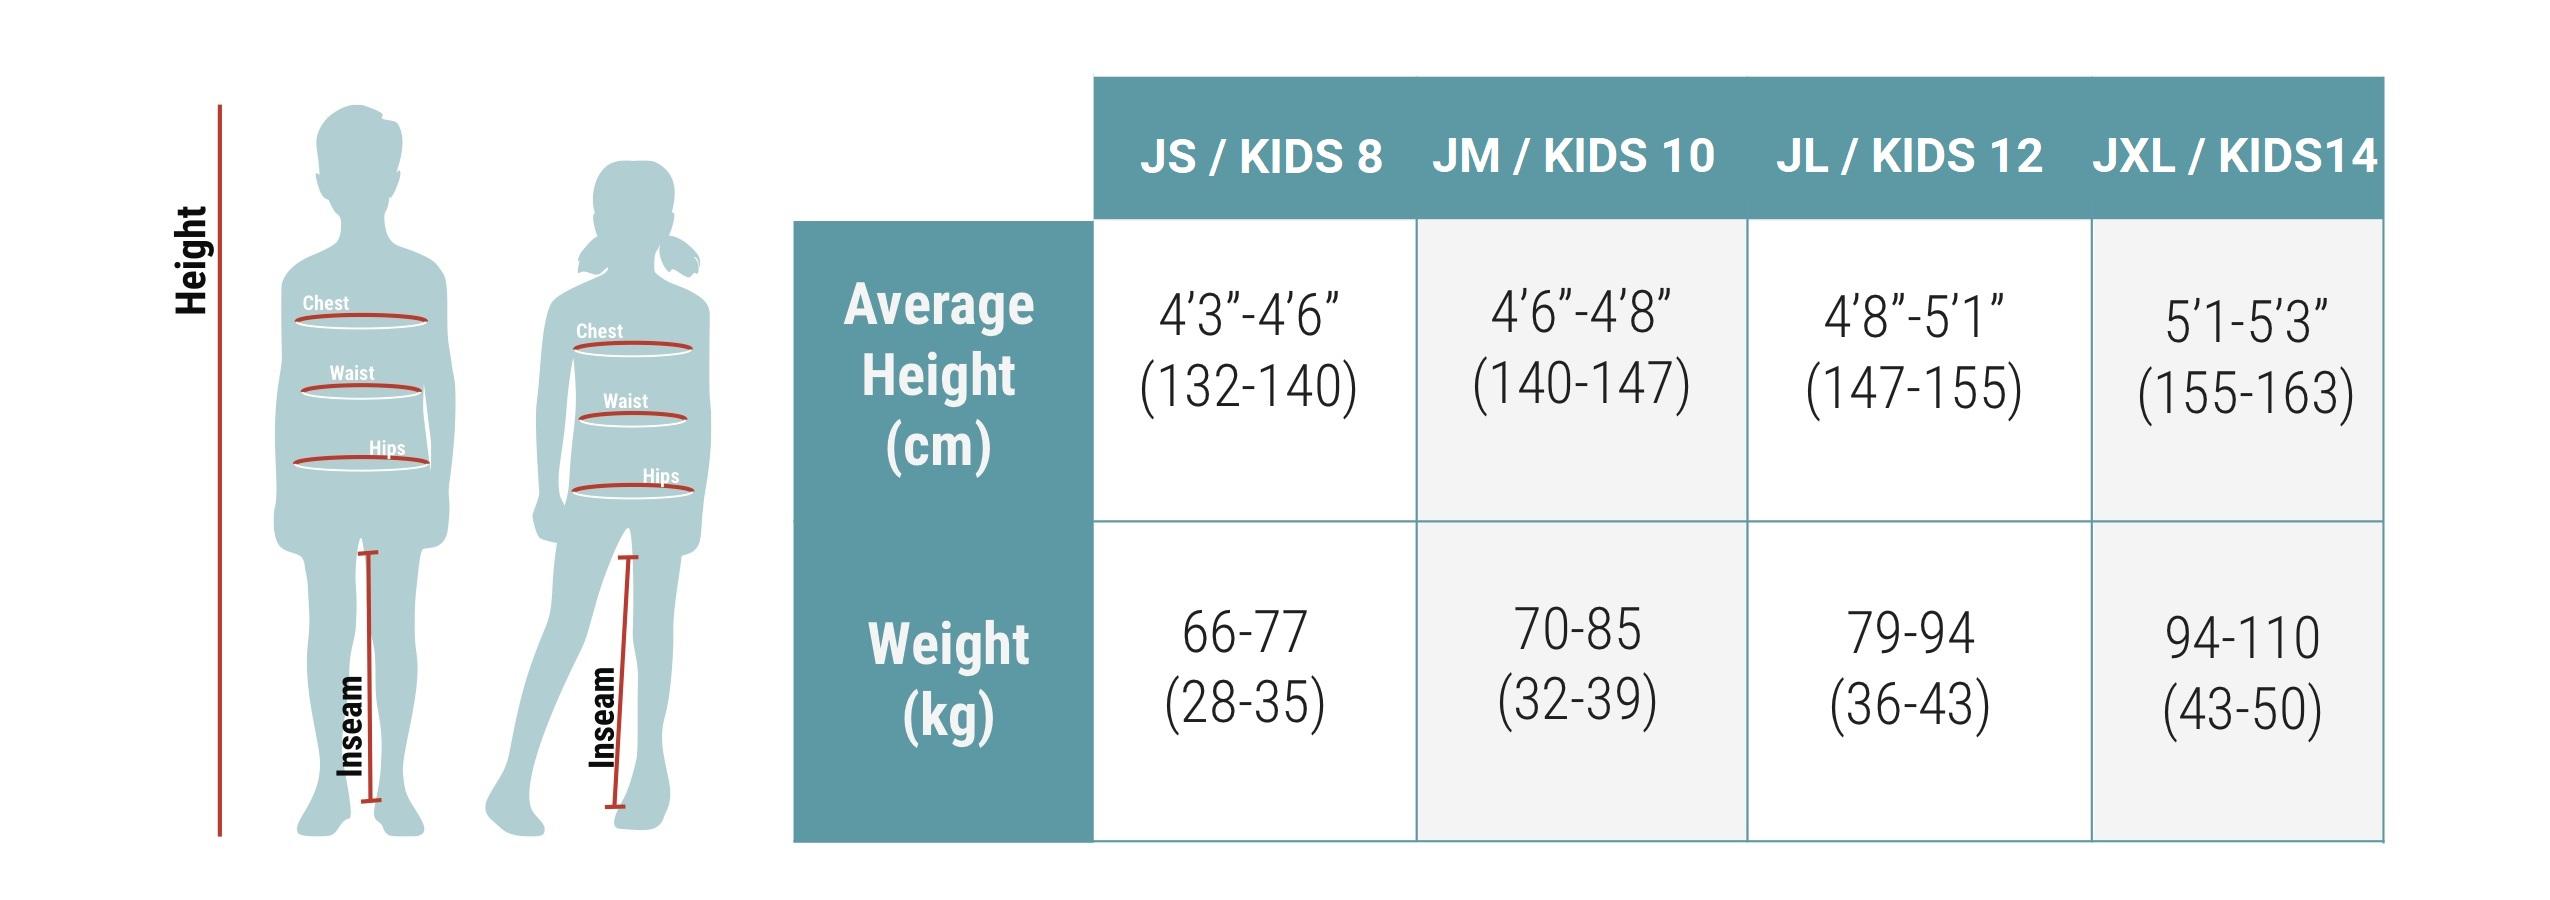 wcs-zhik-junior-sizing-chart.jpg